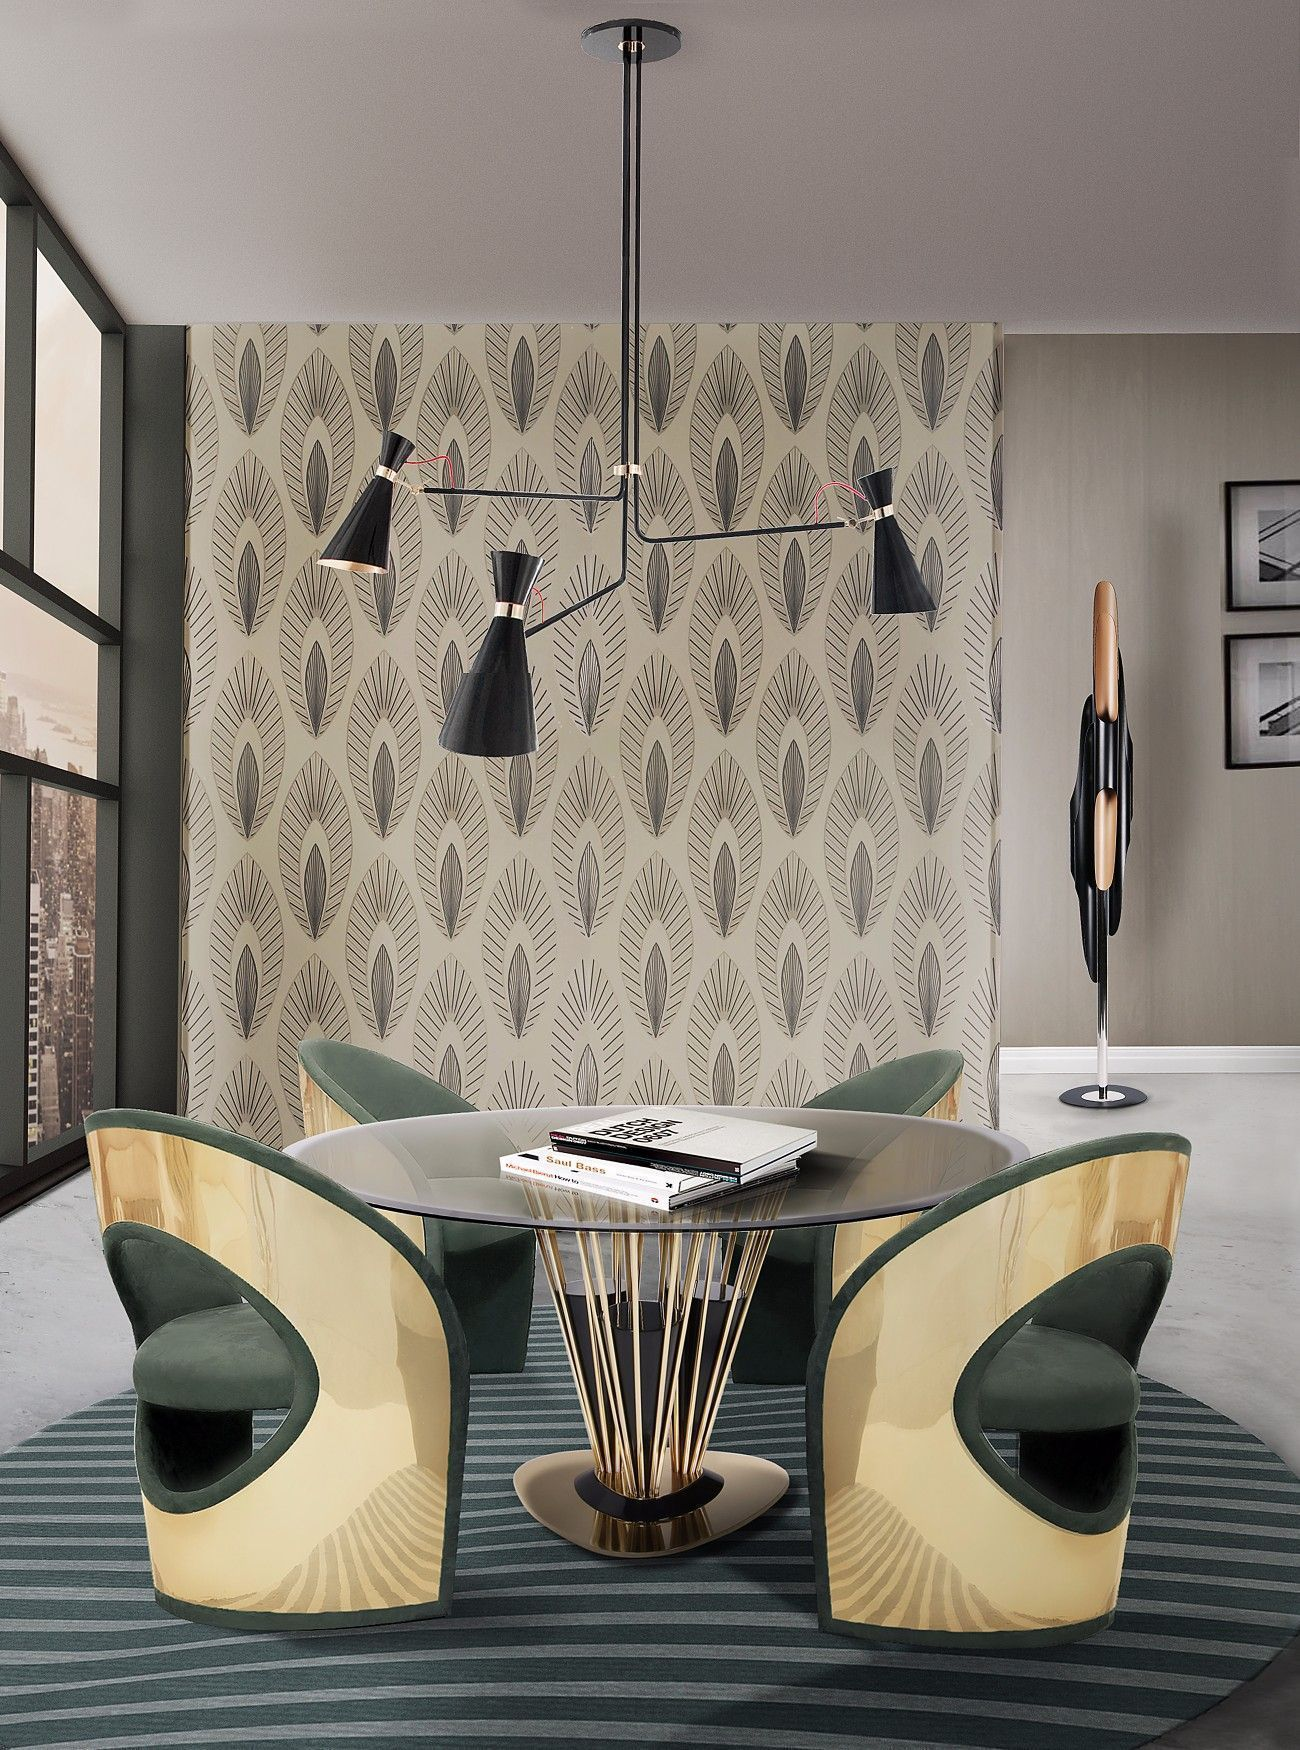 Usa contemporary home decor and mid century modern lighting ideas from delightfull http also pin by karolina serekauskaite on interiors muebles rh co pinterest